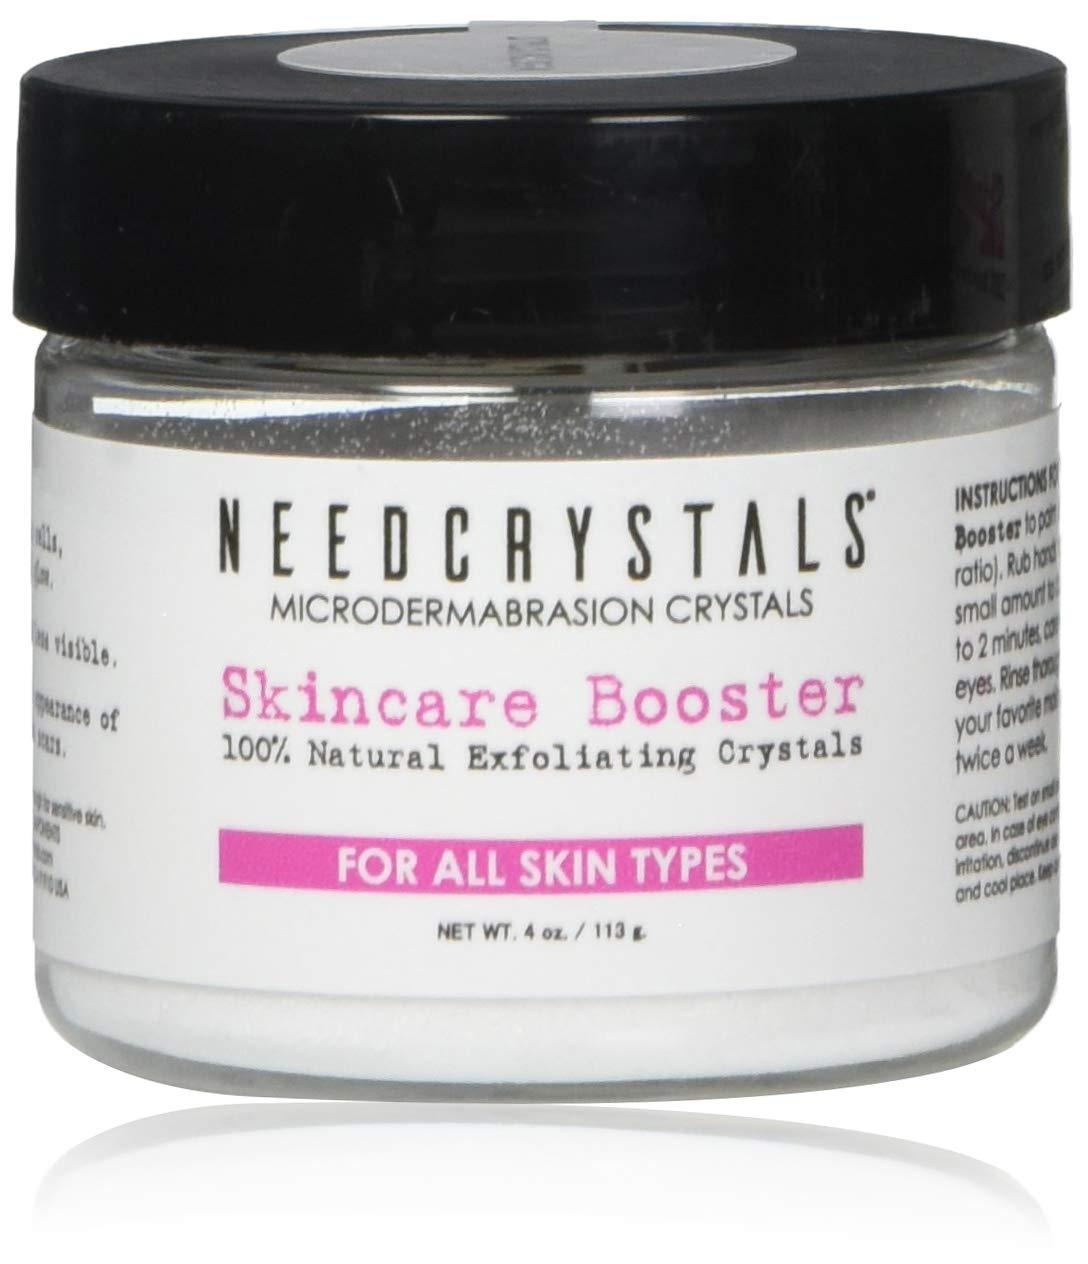 NeedCrystals Microdermabrasion Crystals 4 oz. / 113 gr. DIY Face Scrub. Natural Facial Exfoliator